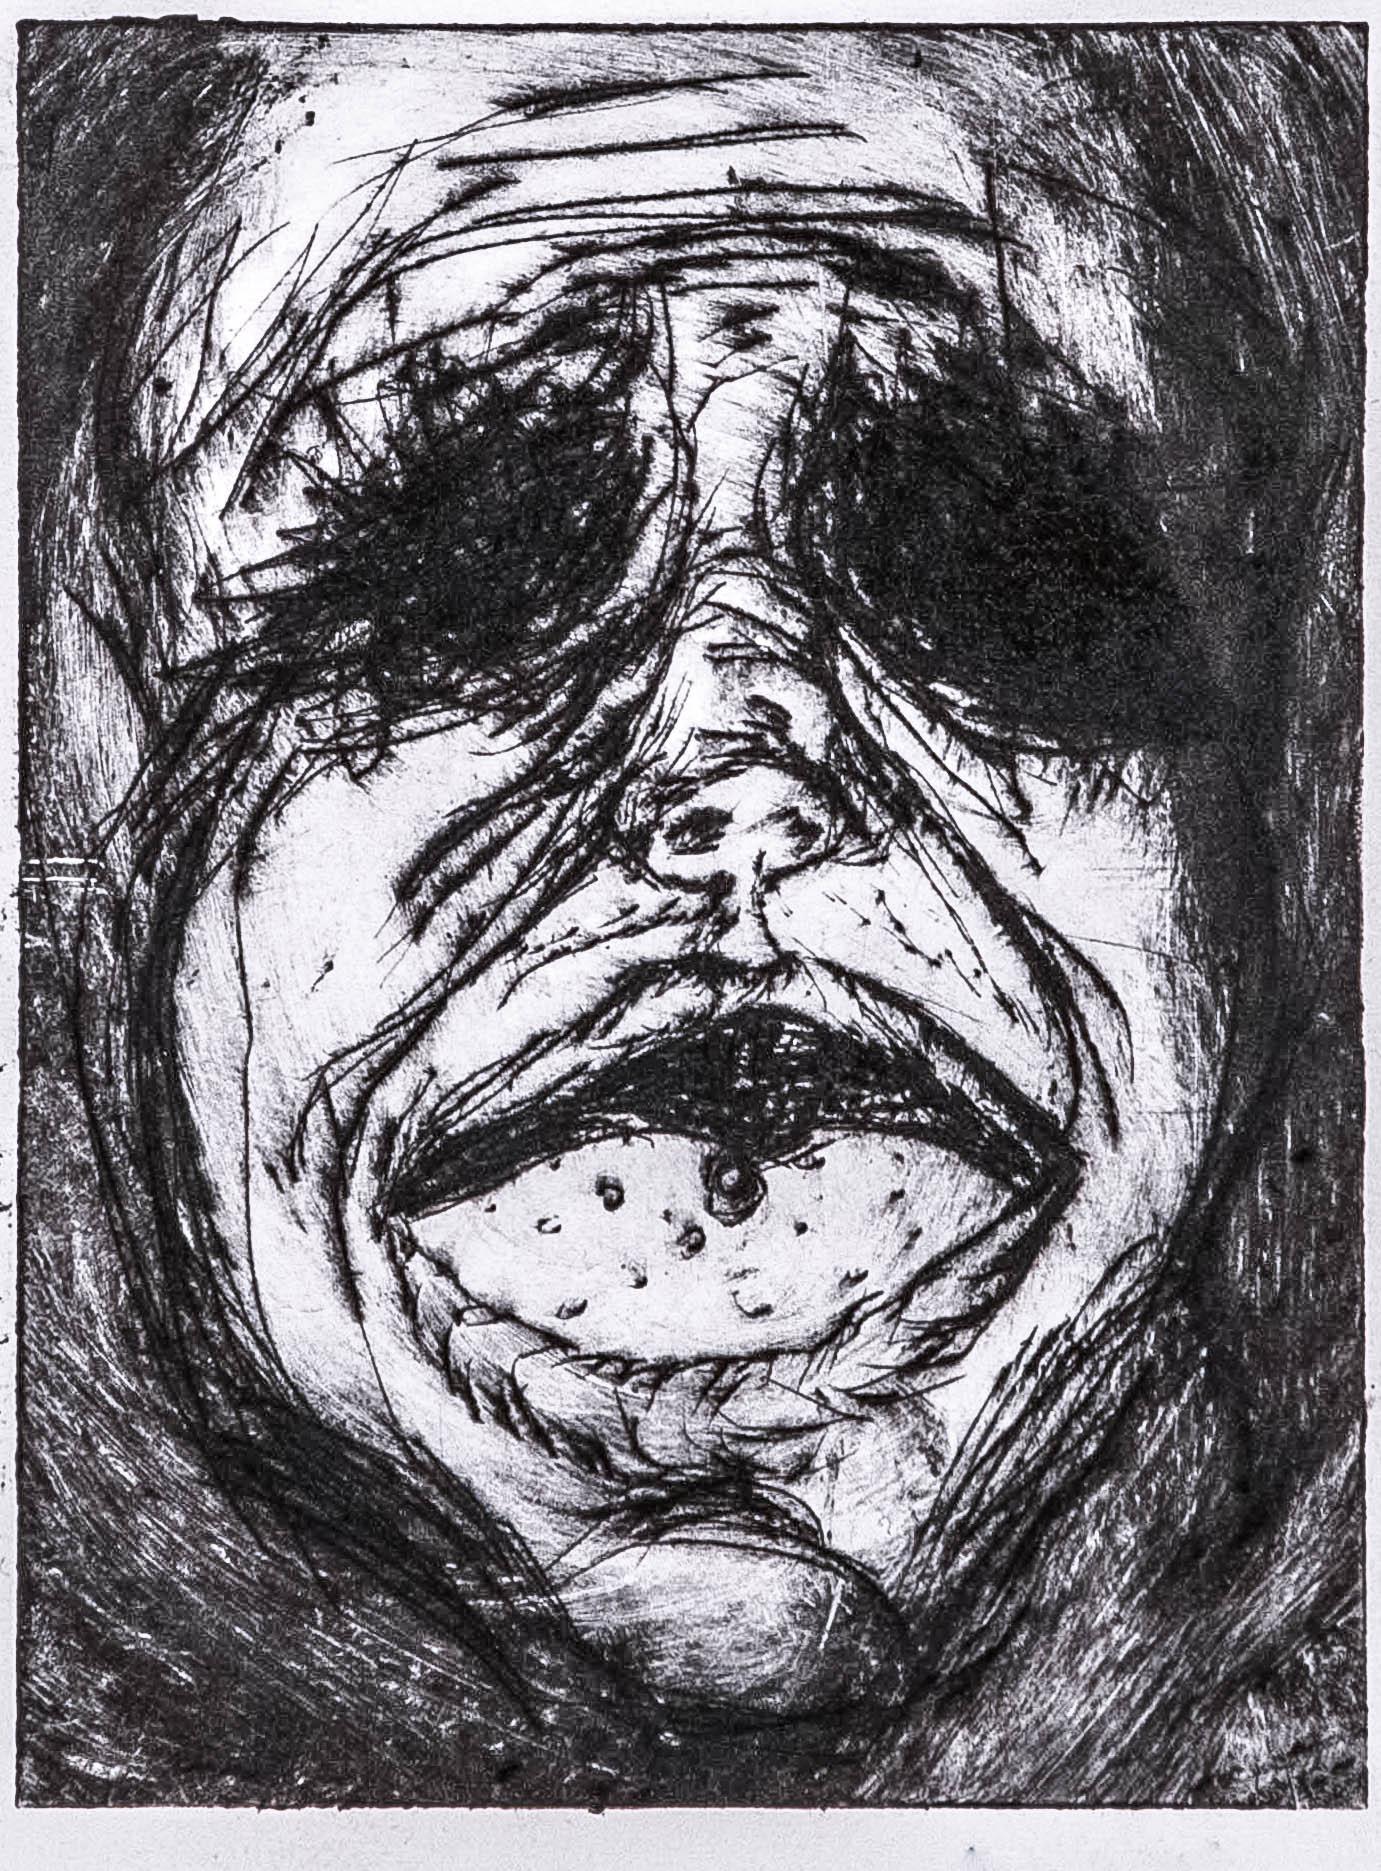 Regina Viqueira, A pill to swallow, 2013, intaglio print